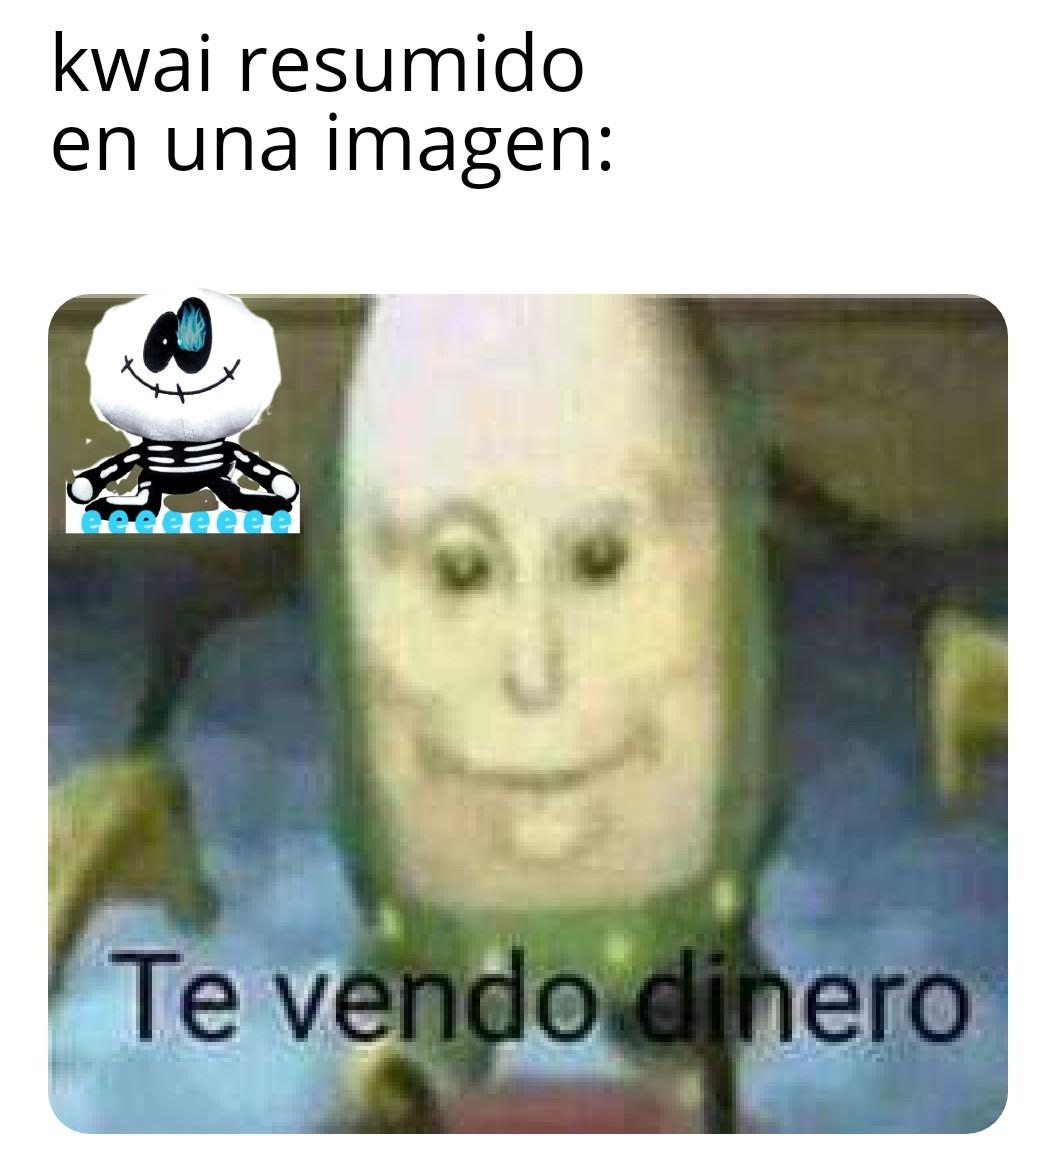 Remake - meme